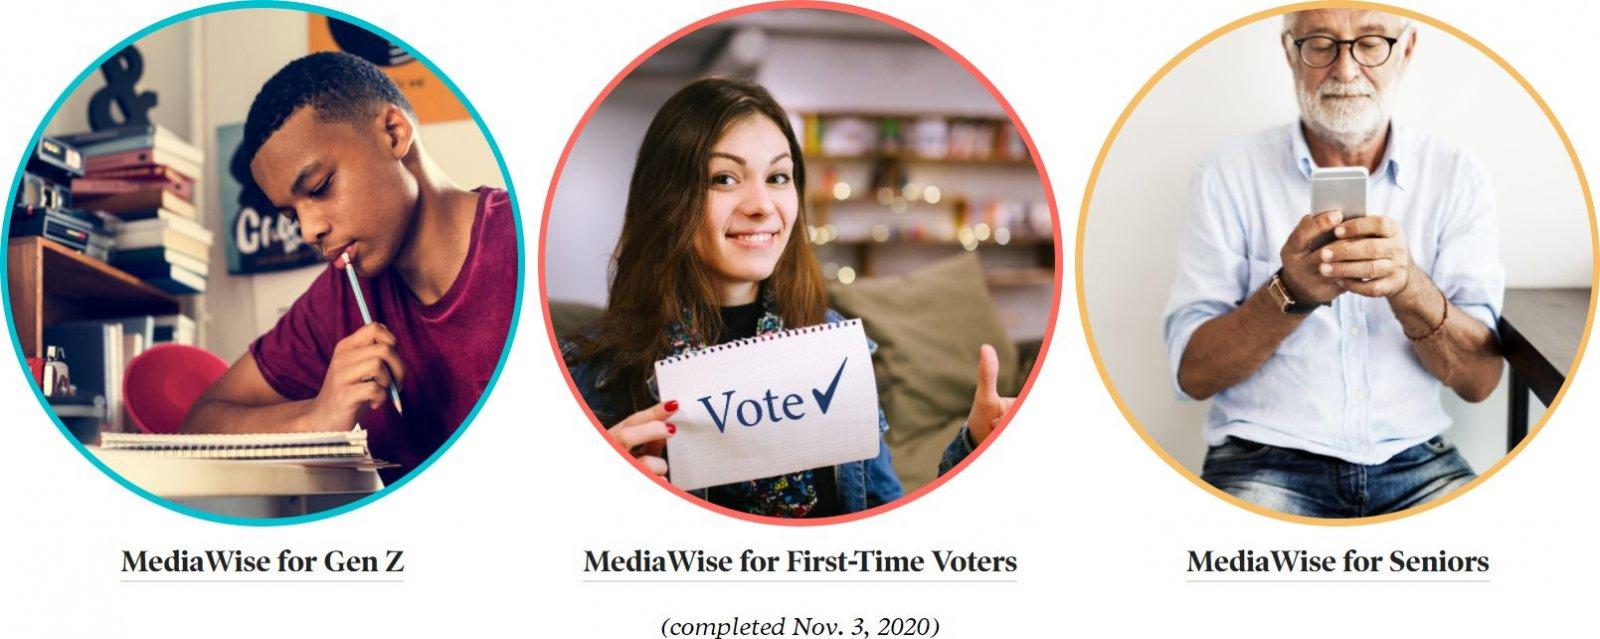 mediawise.jpg